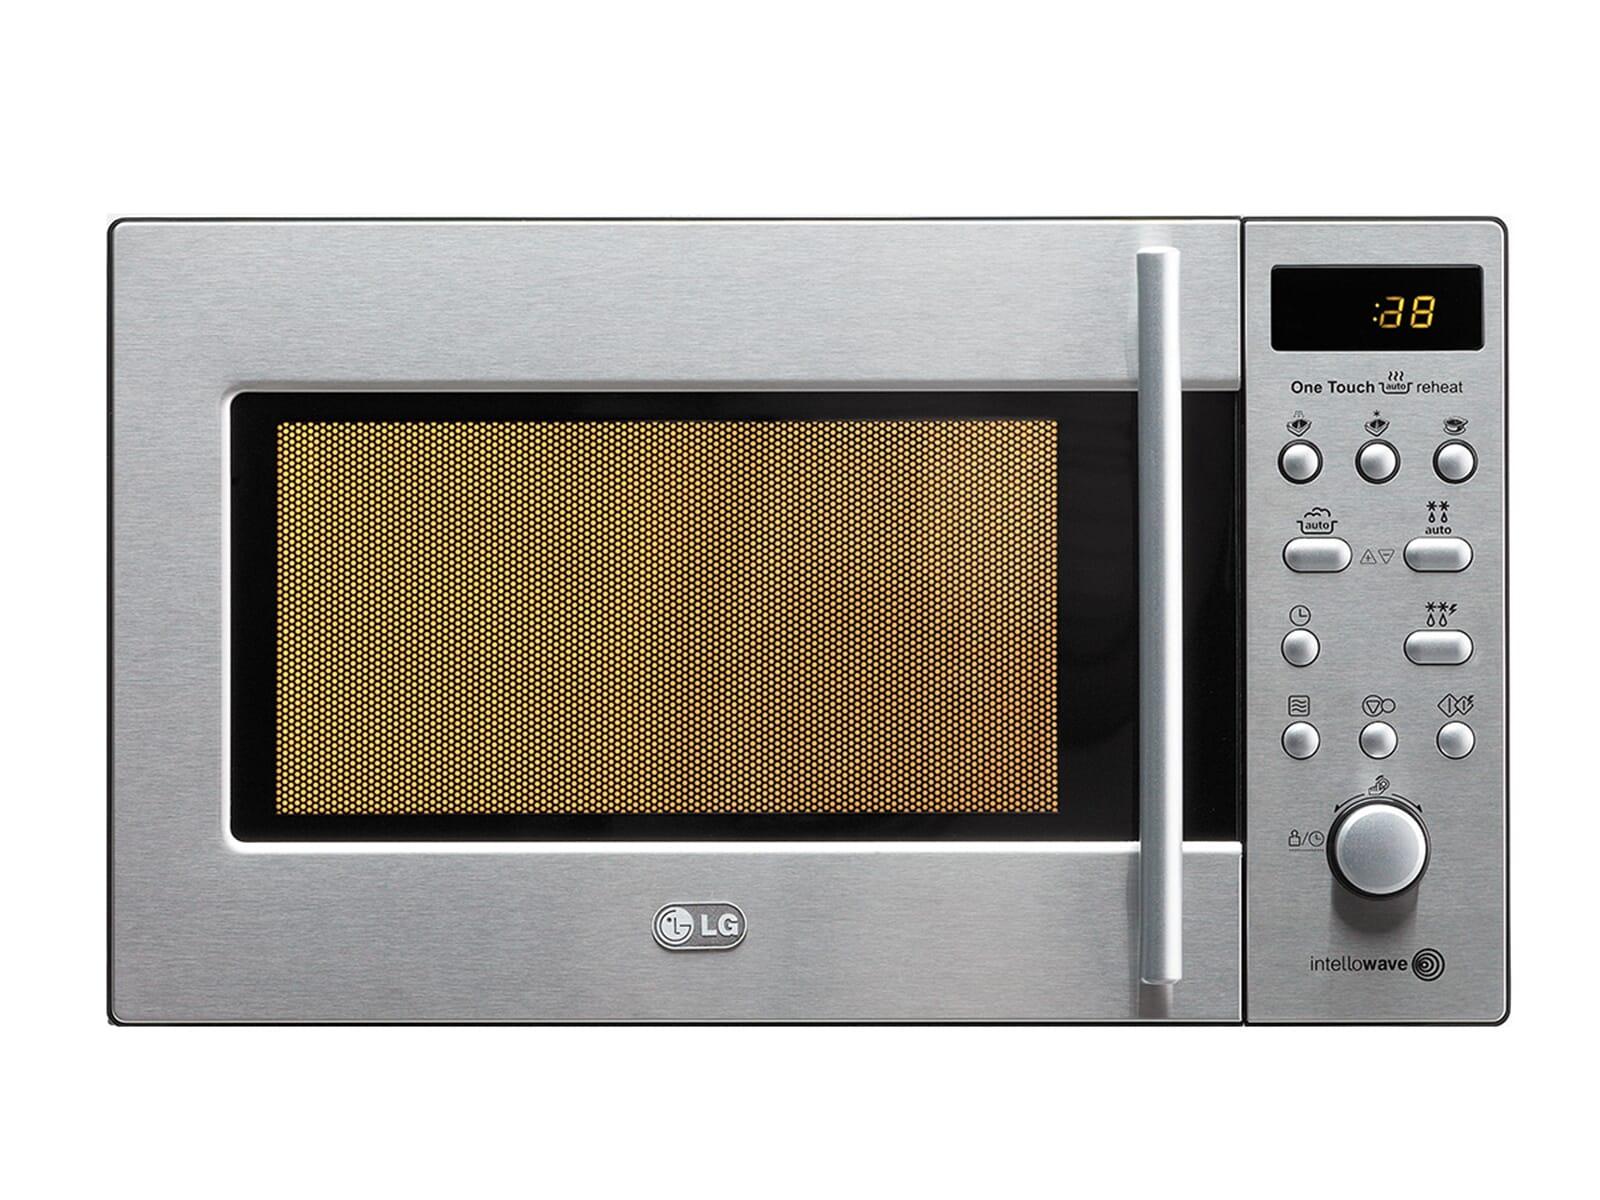 lg ms 1986 kit mikrowelle edelstahl einbau 800w gewichtsautomatik ebay. Black Bedroom Furniture Sets. Home Design Ideas